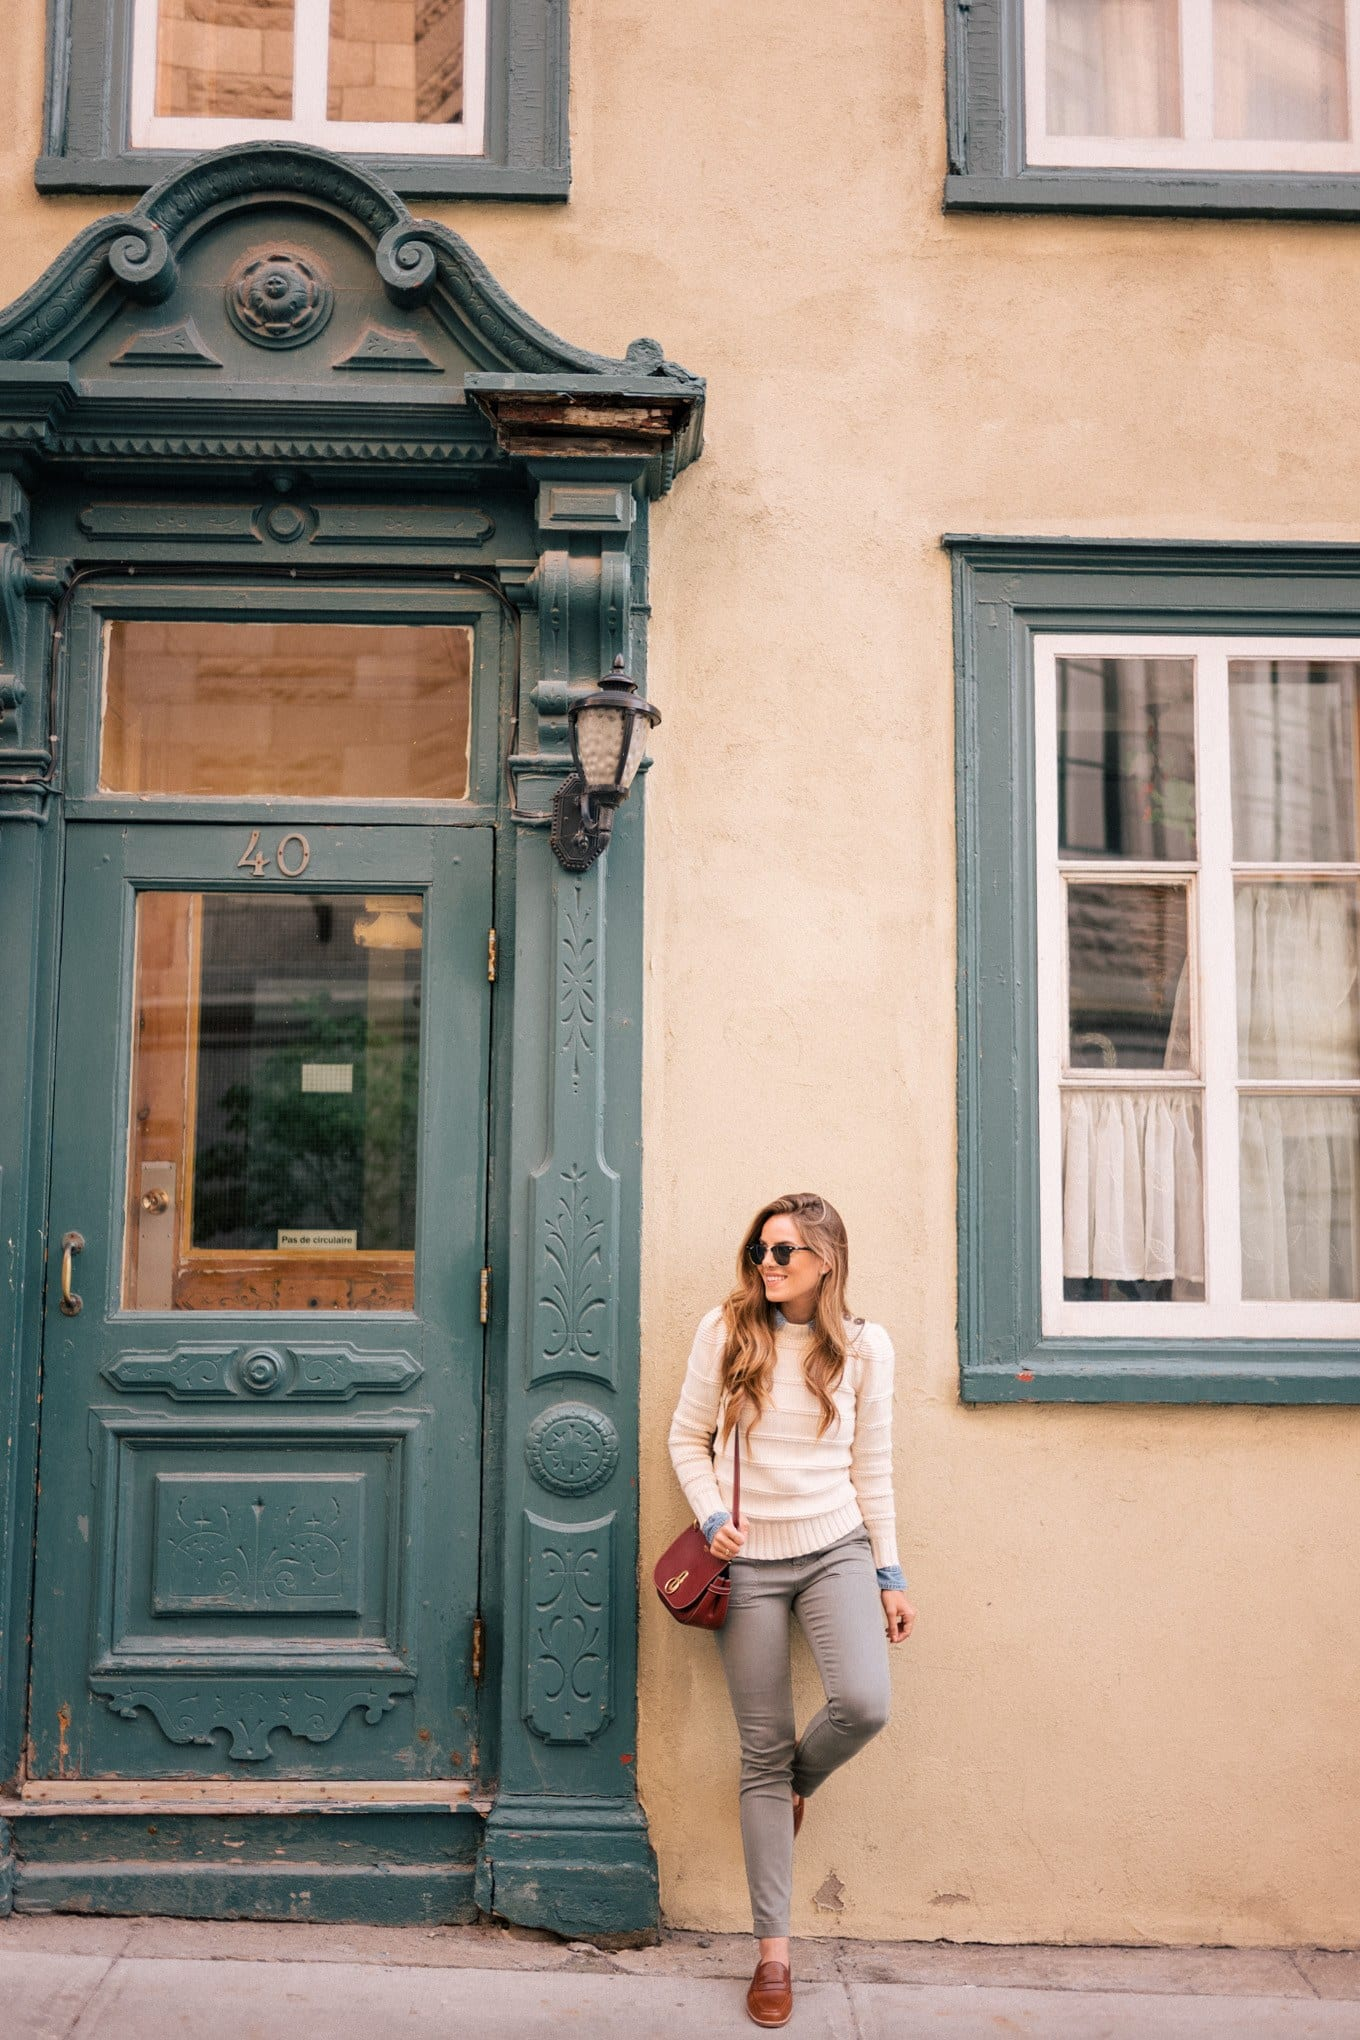 Women Honeymoon Outfits 20 Ideas What To Wear On Honeymoon